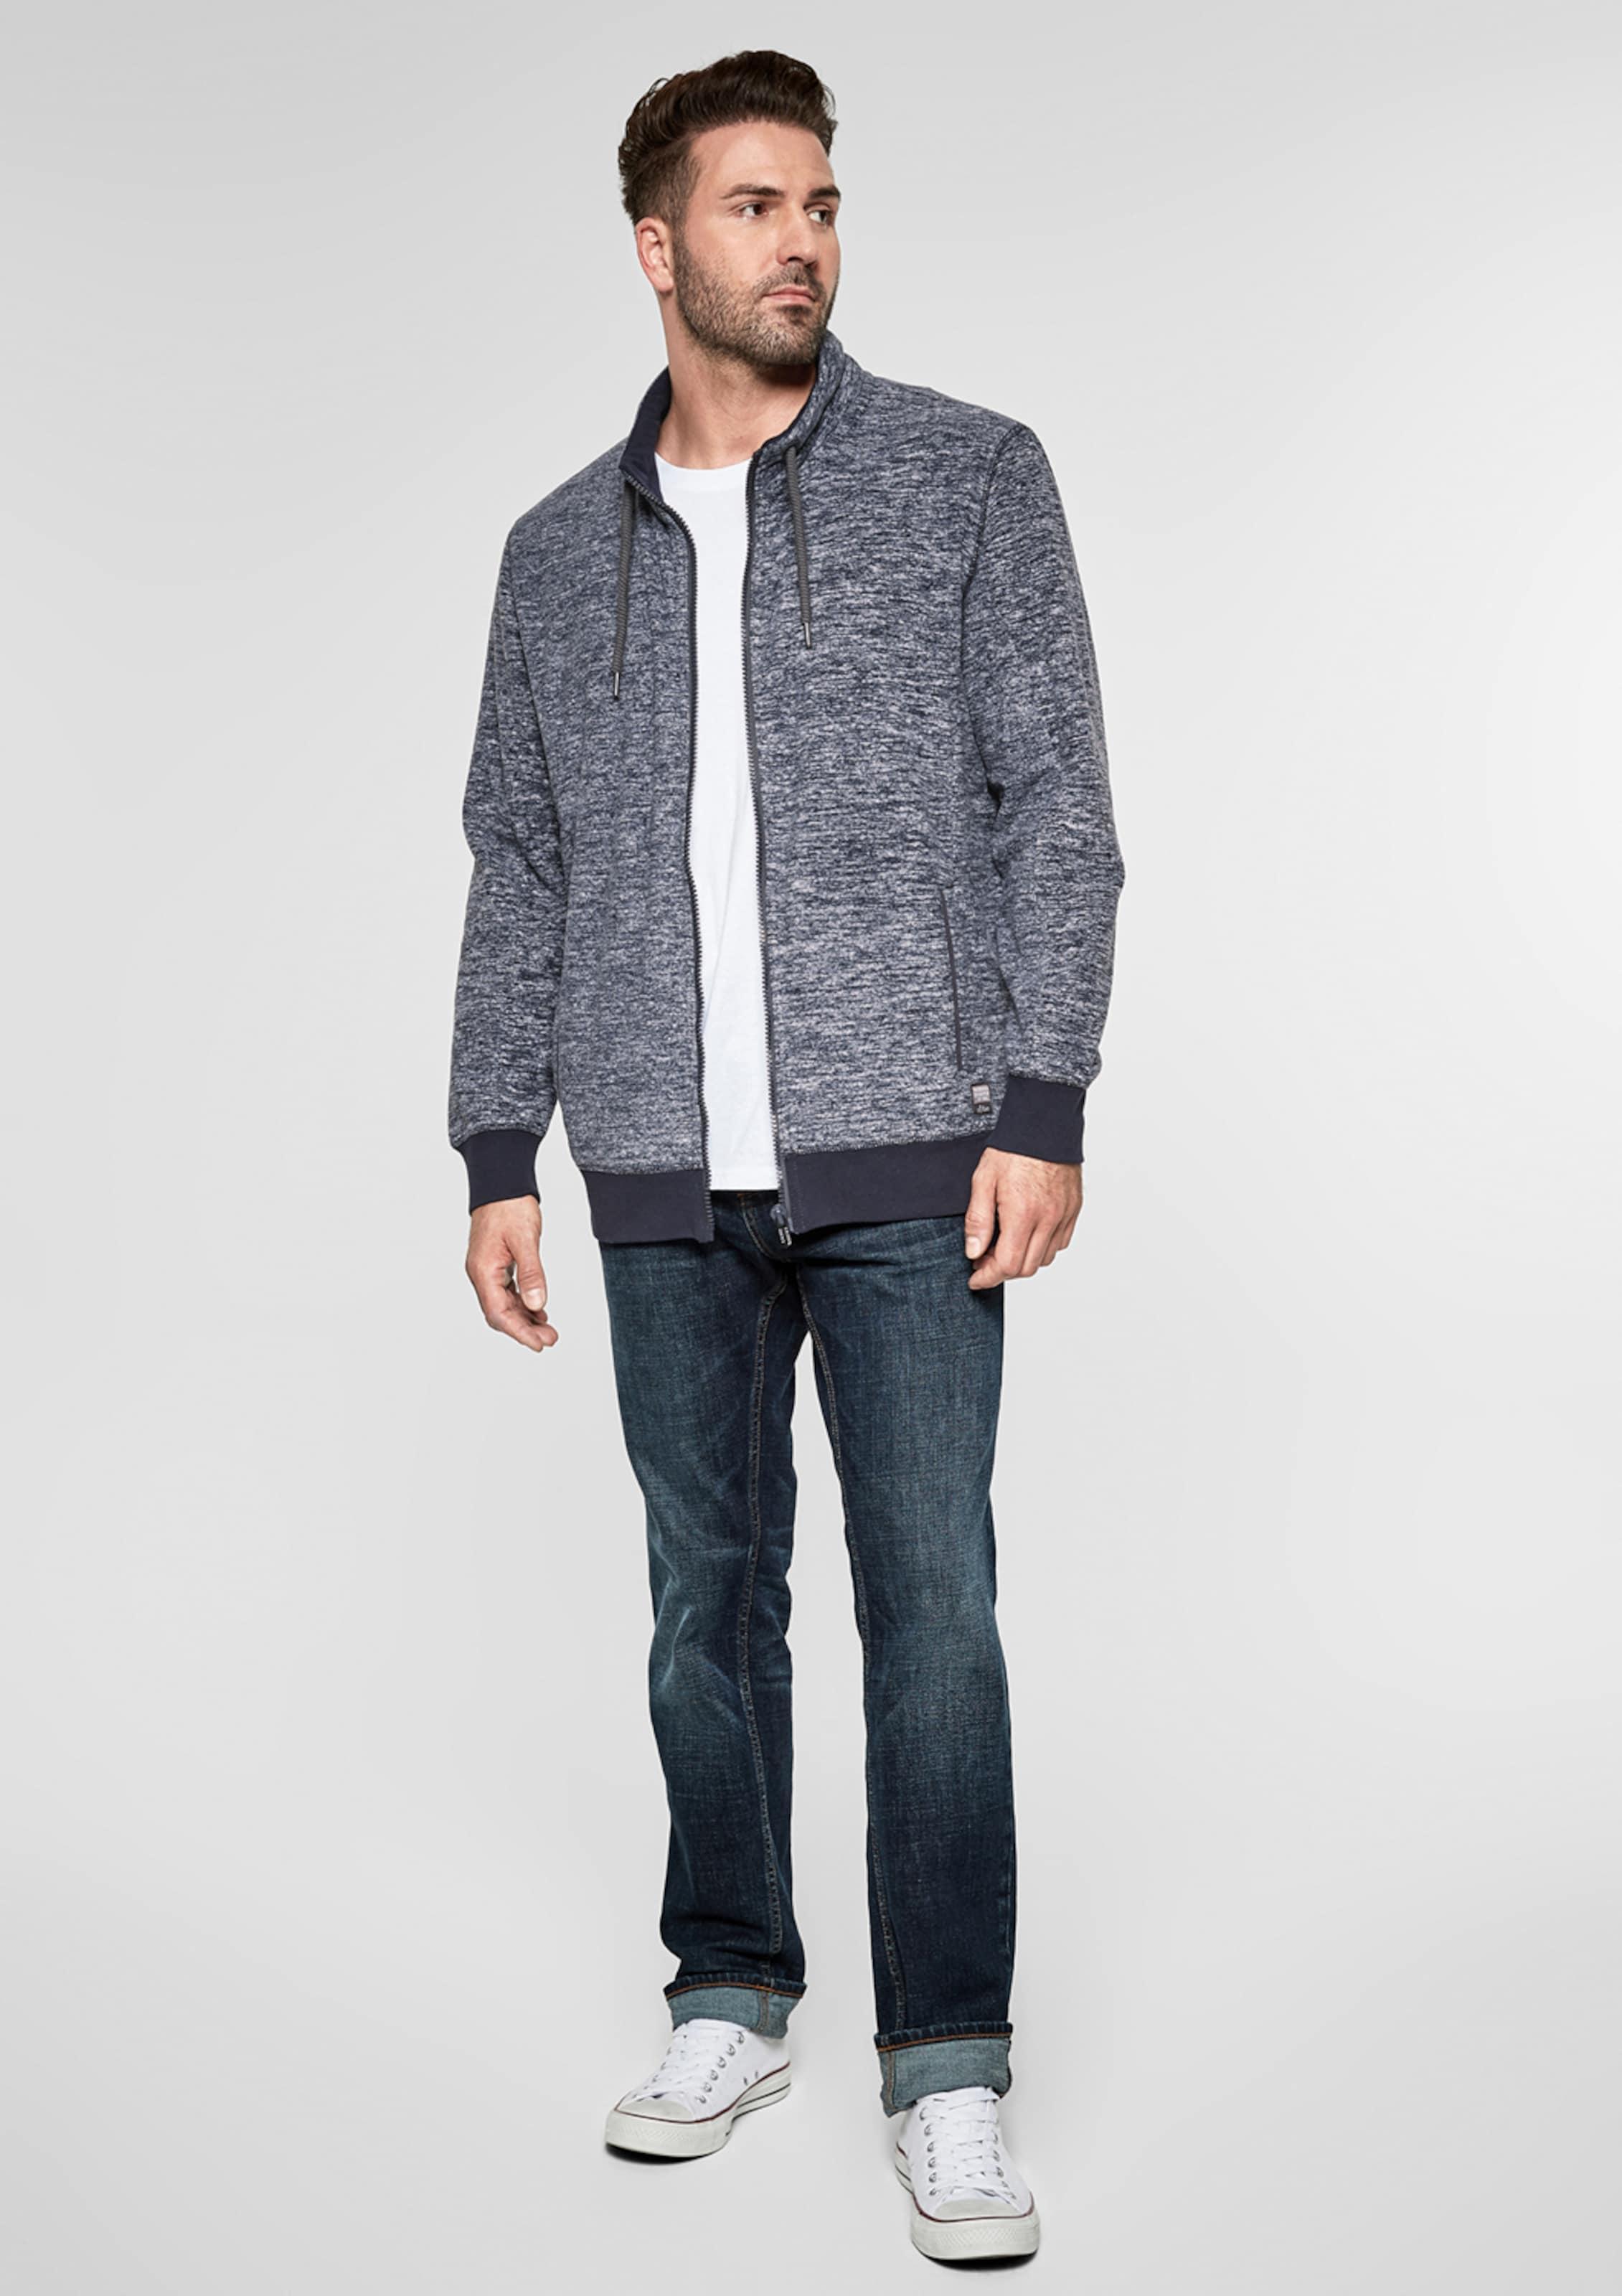 Label oliver In Jacke Fleece MarineNachtblau S Red SqVMpUz